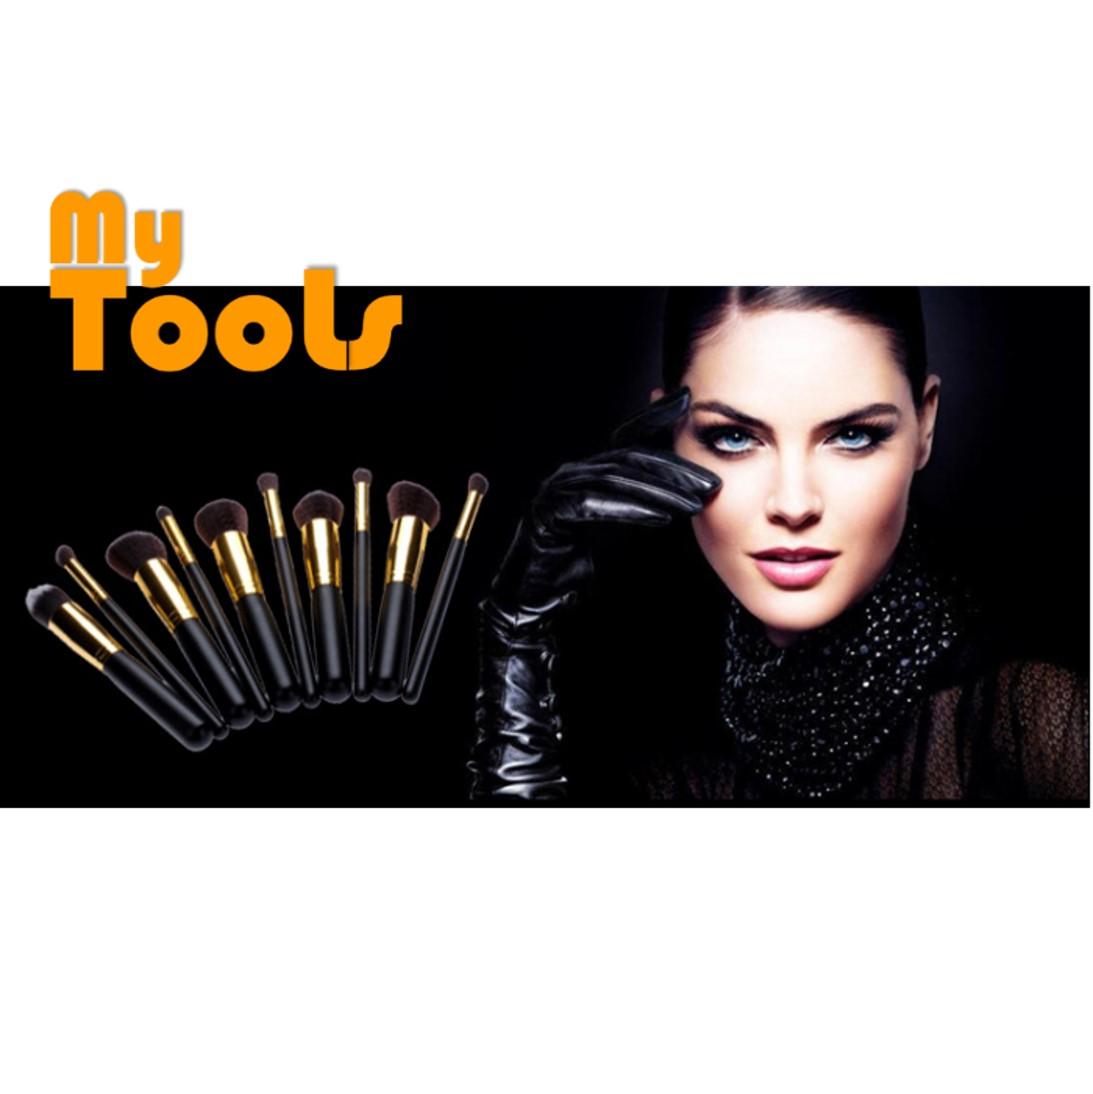 10pcs Make up Brush Kit Black Gold Mekeup Cosmetic Tool